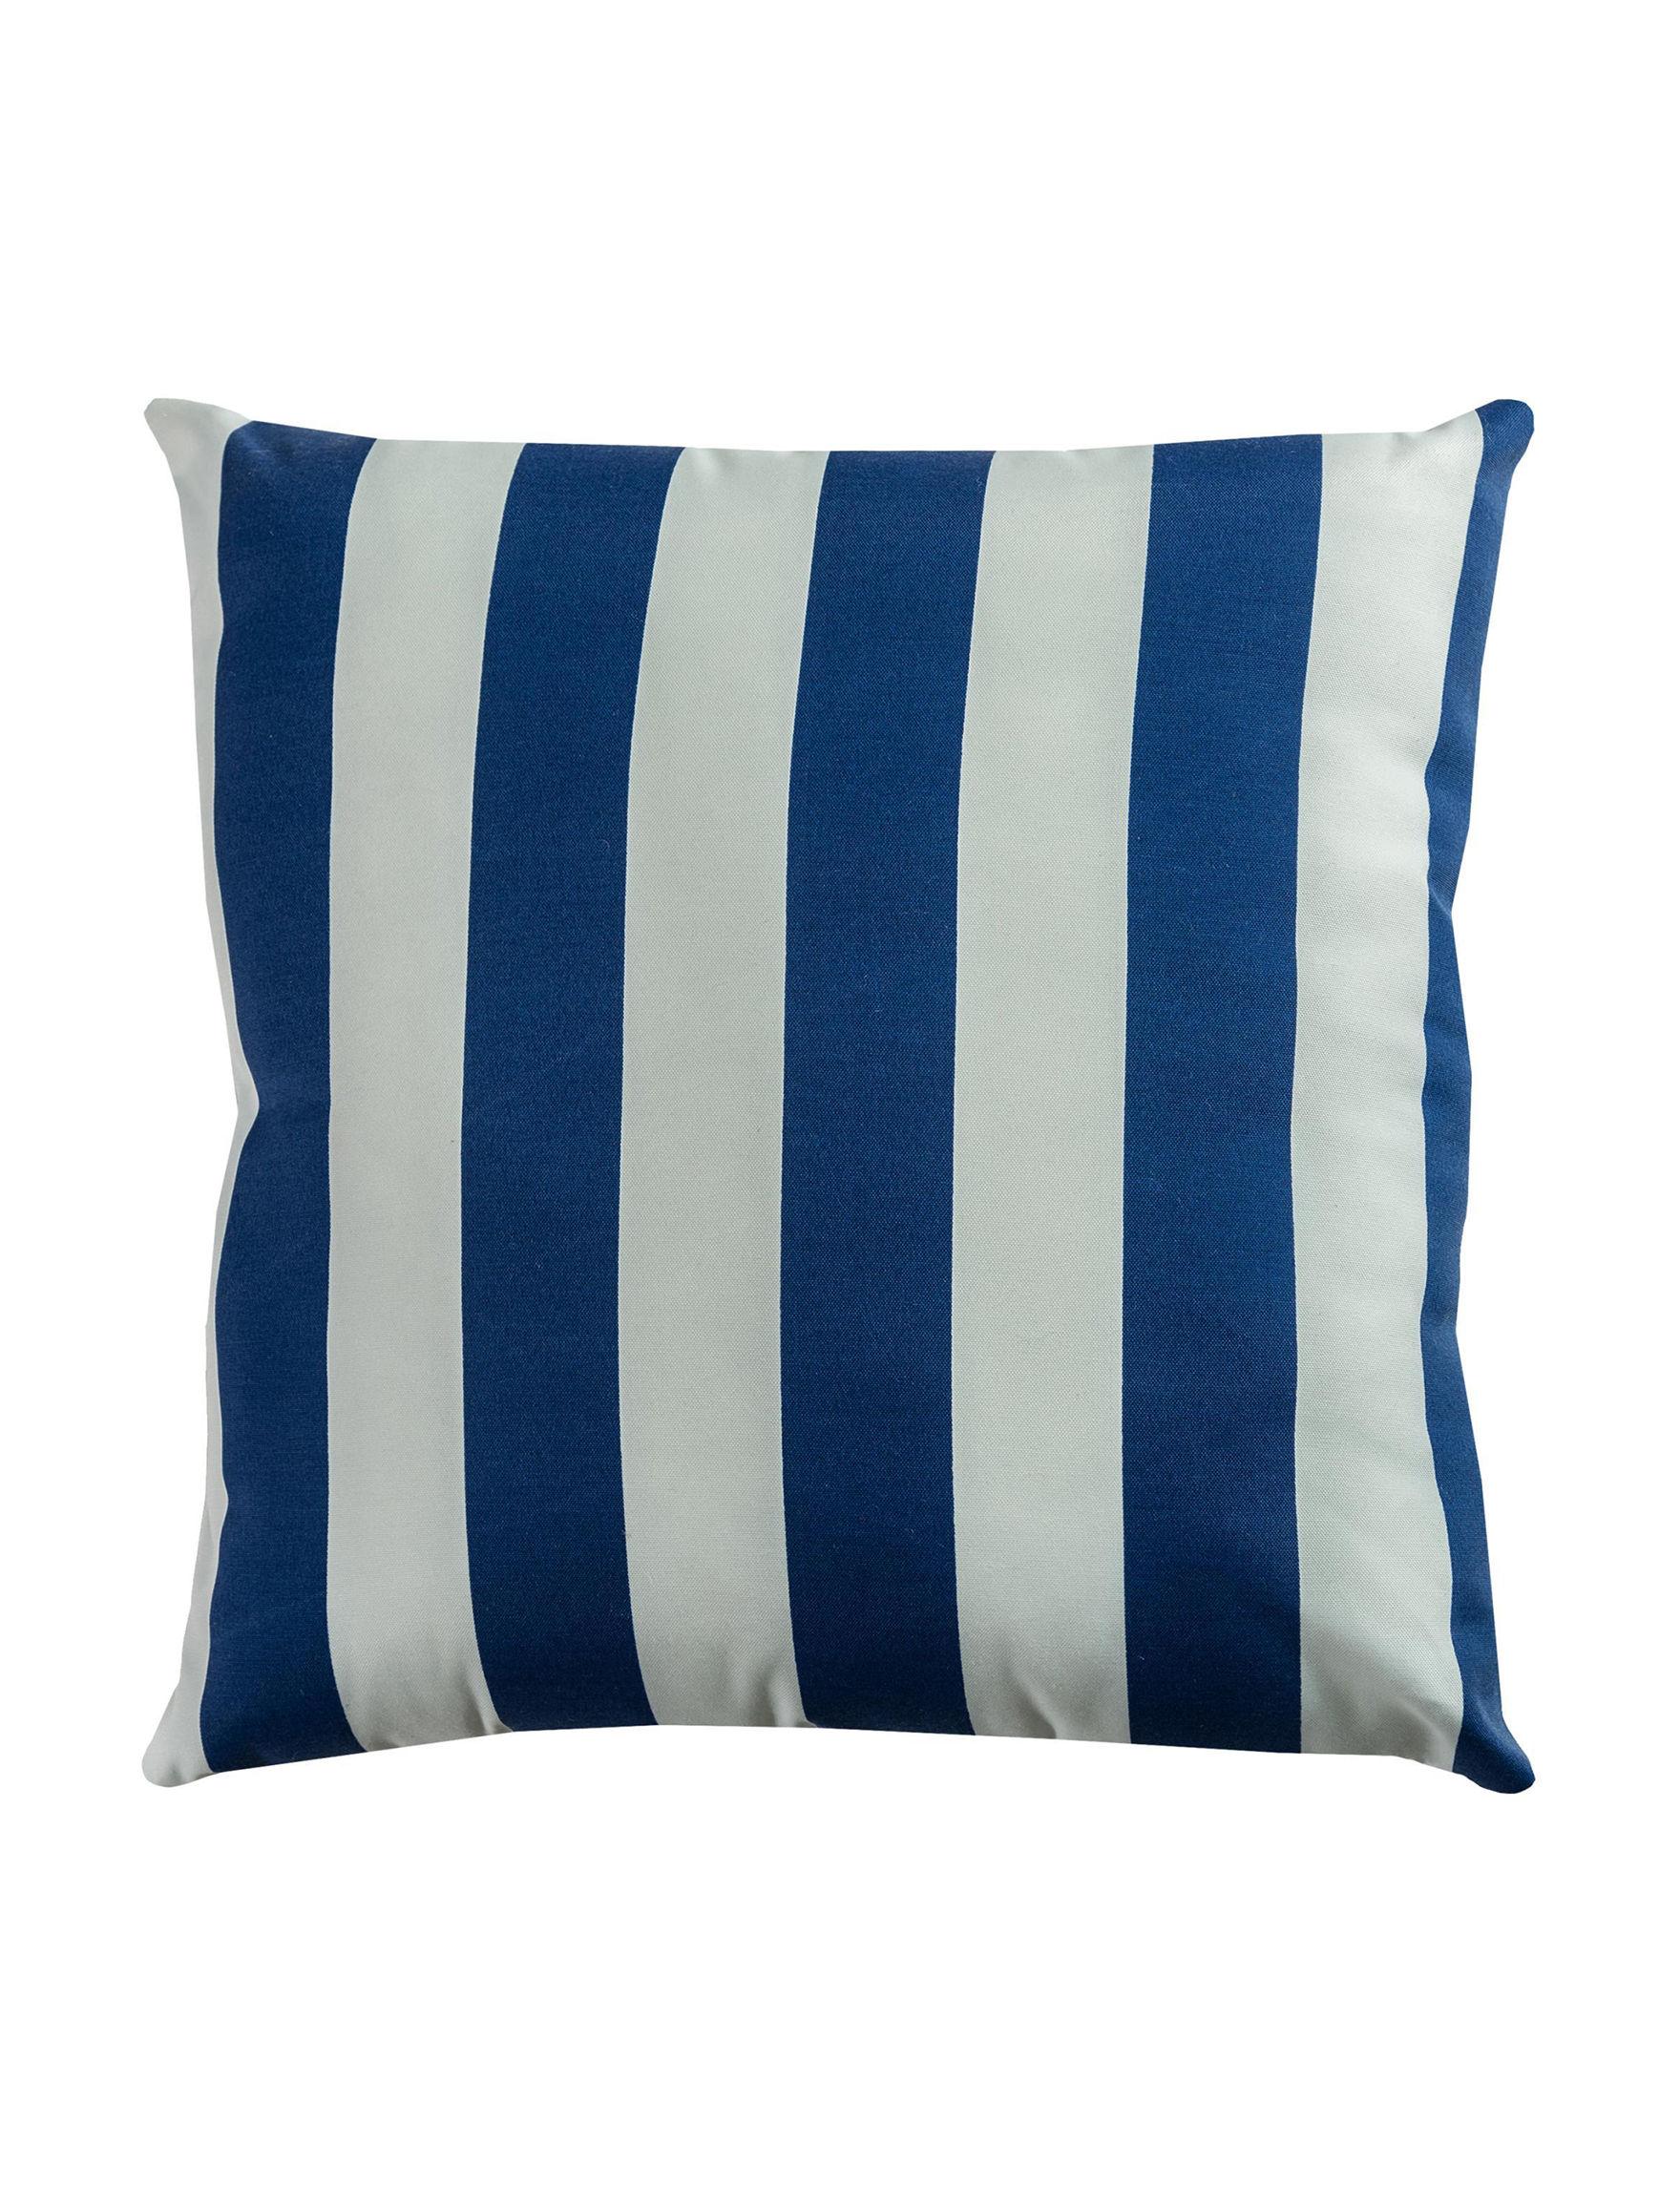 Rizzy Home Blue / White Decorative Pillows